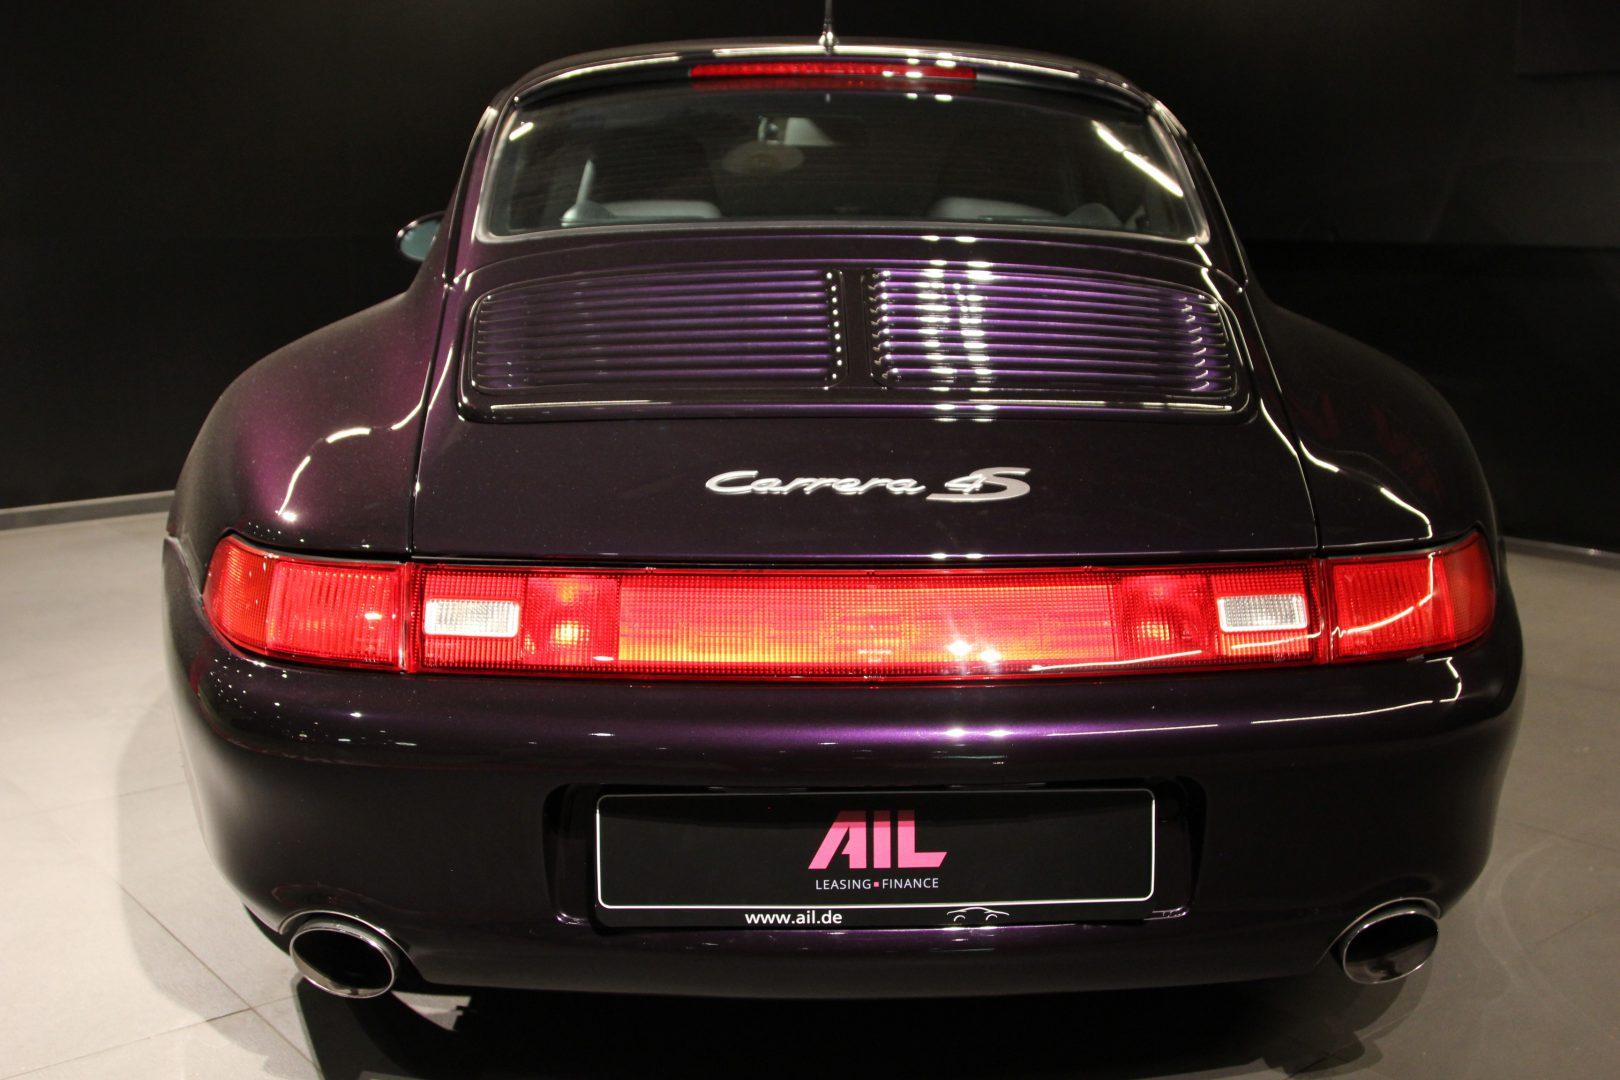 AIL Porsche 911 993 Carrera 4S 3